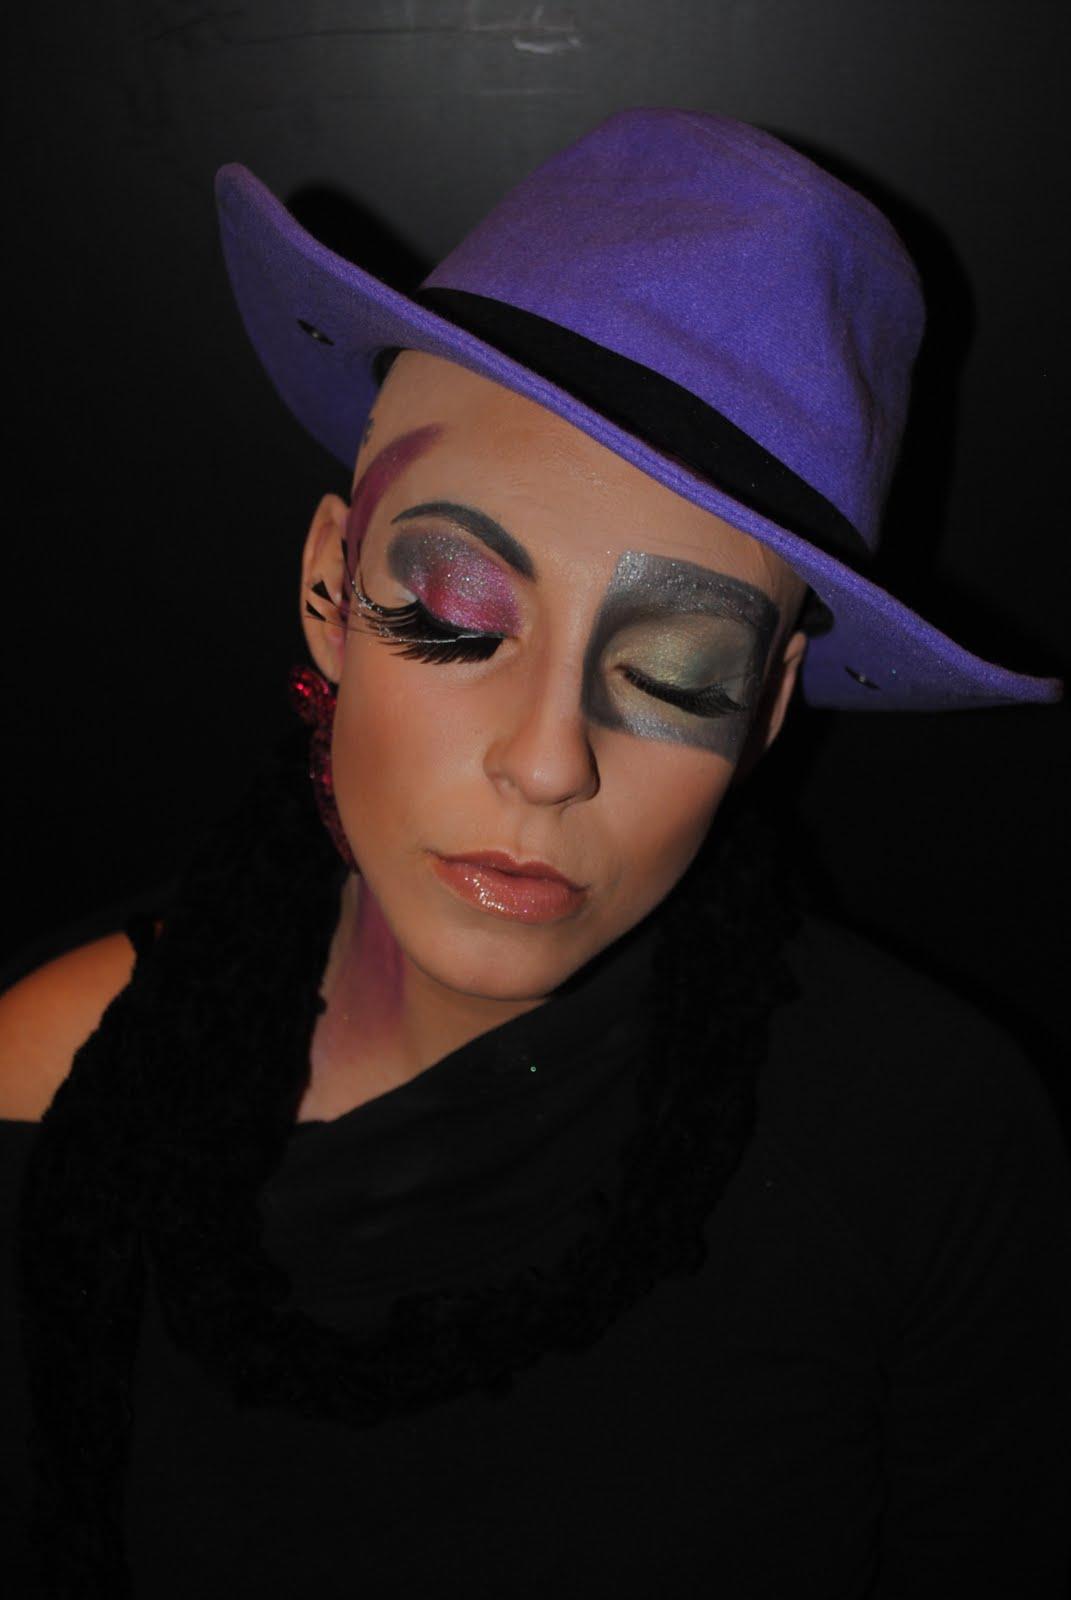 Sarah Bahlibi Makeup: Boy George inspired